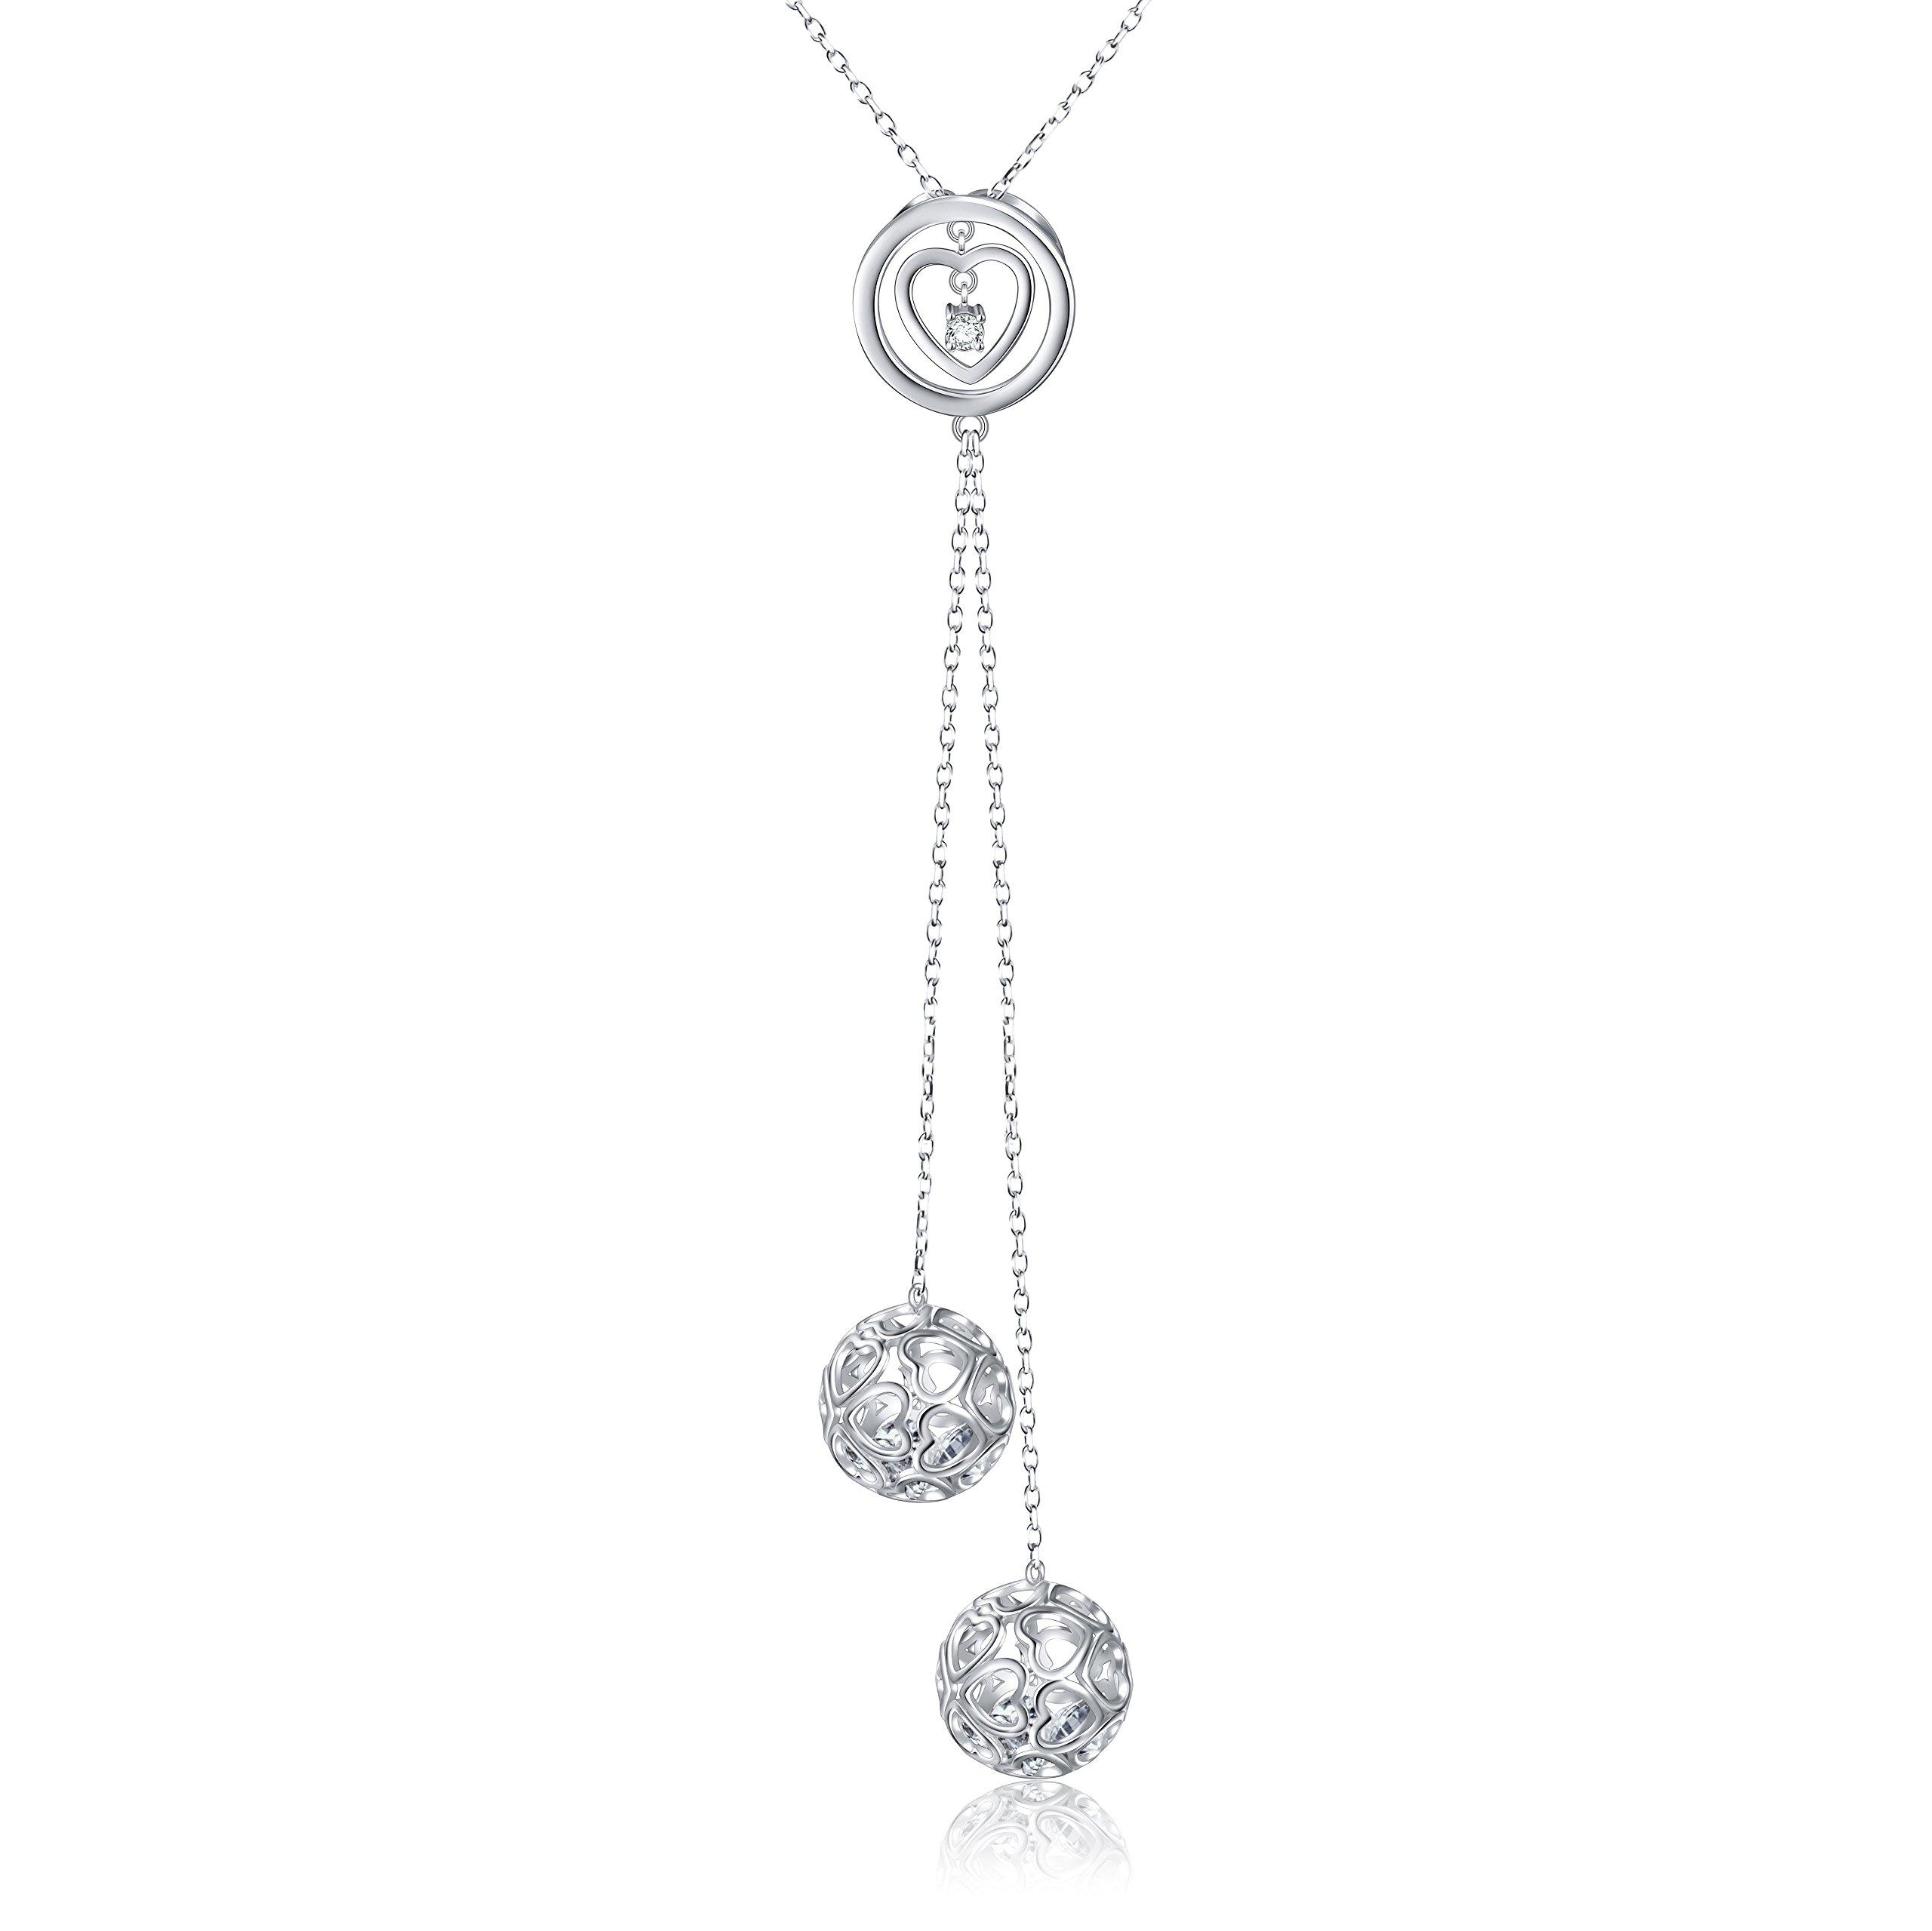 SILVER MOUNTAIN S925 Sterling Silver Long Chain Heart Necklace Dangle Tassel Pendant for Women 30'' Chain